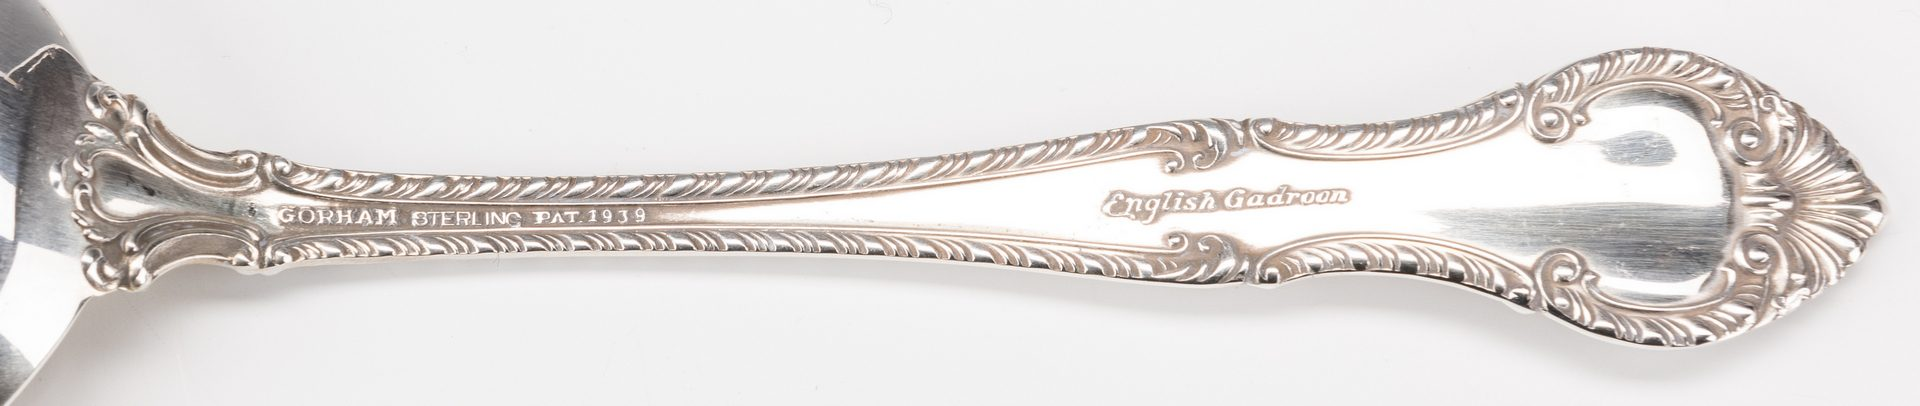 Lot 397: Gorham English Gadroon Sterling Flatware, 100 pcs